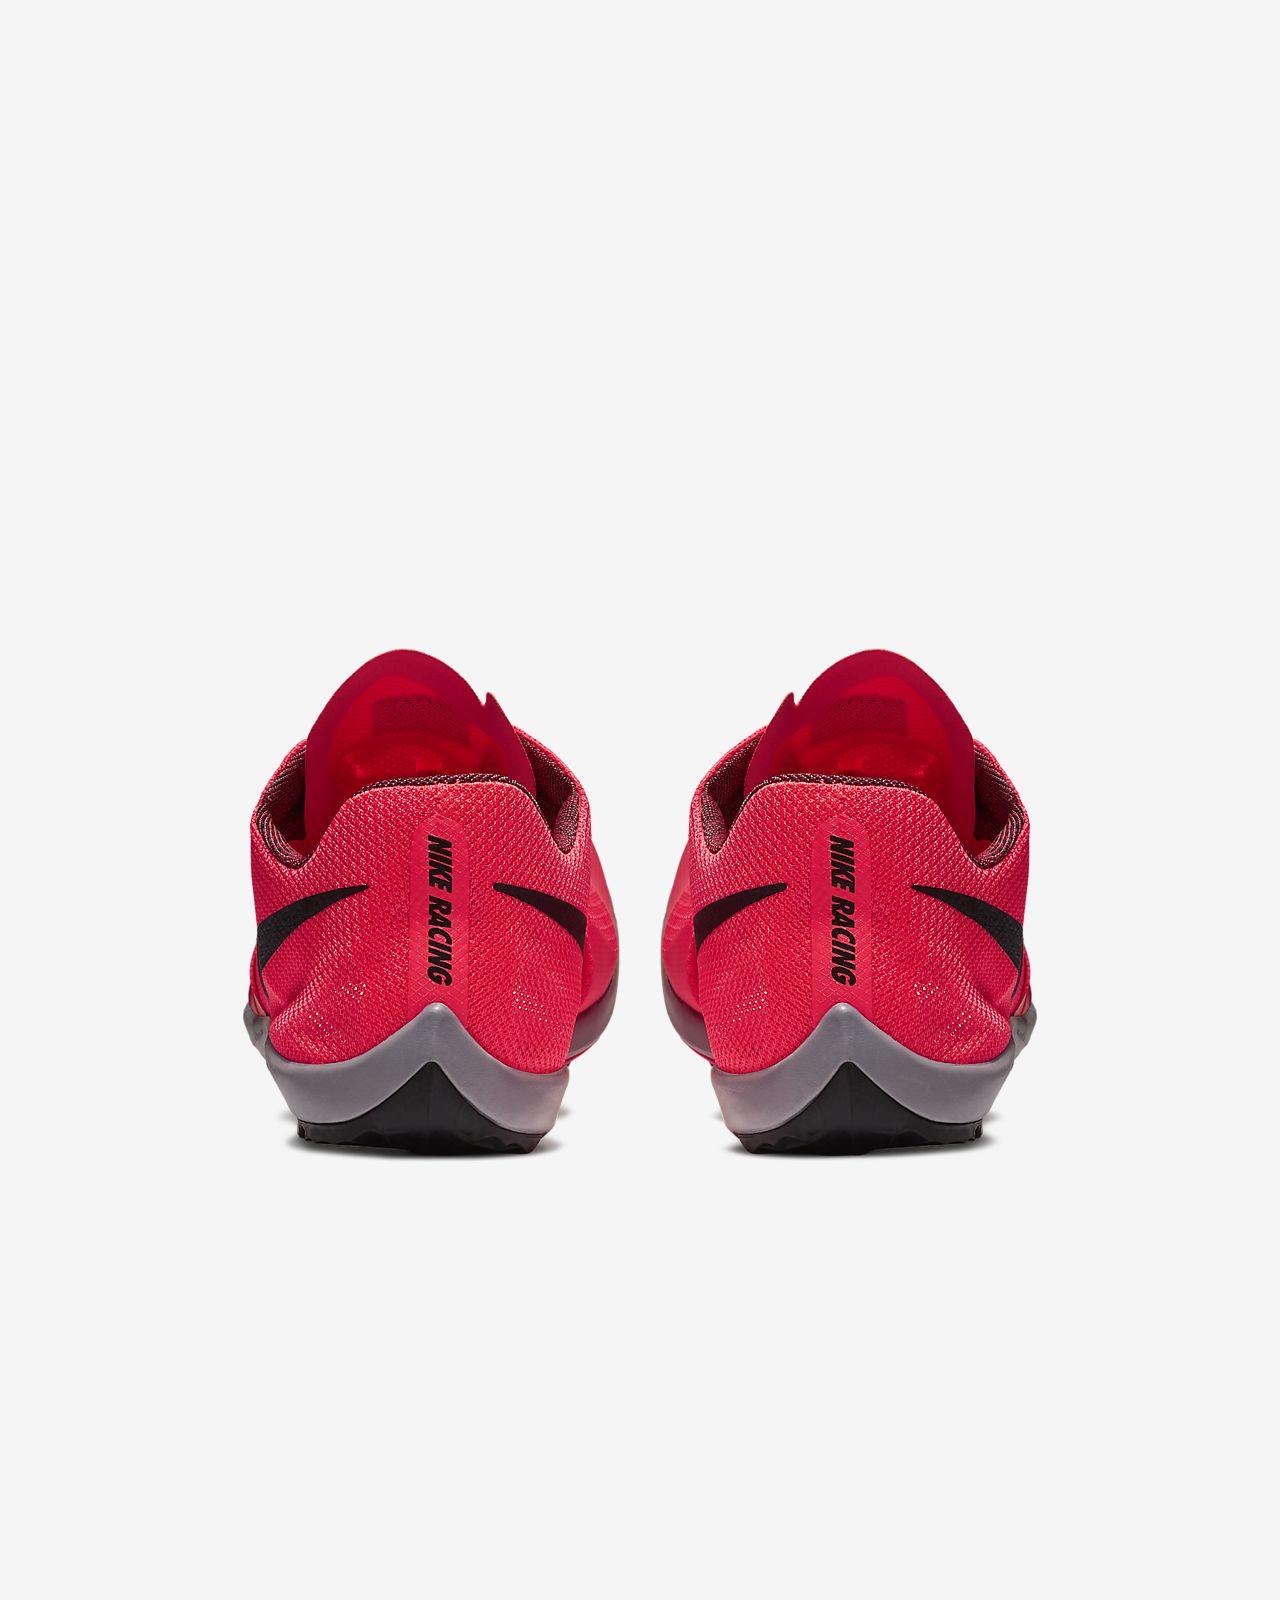 hot sale online 3020d 0b0d5 ... Nike Zoom Forever XC 5 Unisex Track Spike